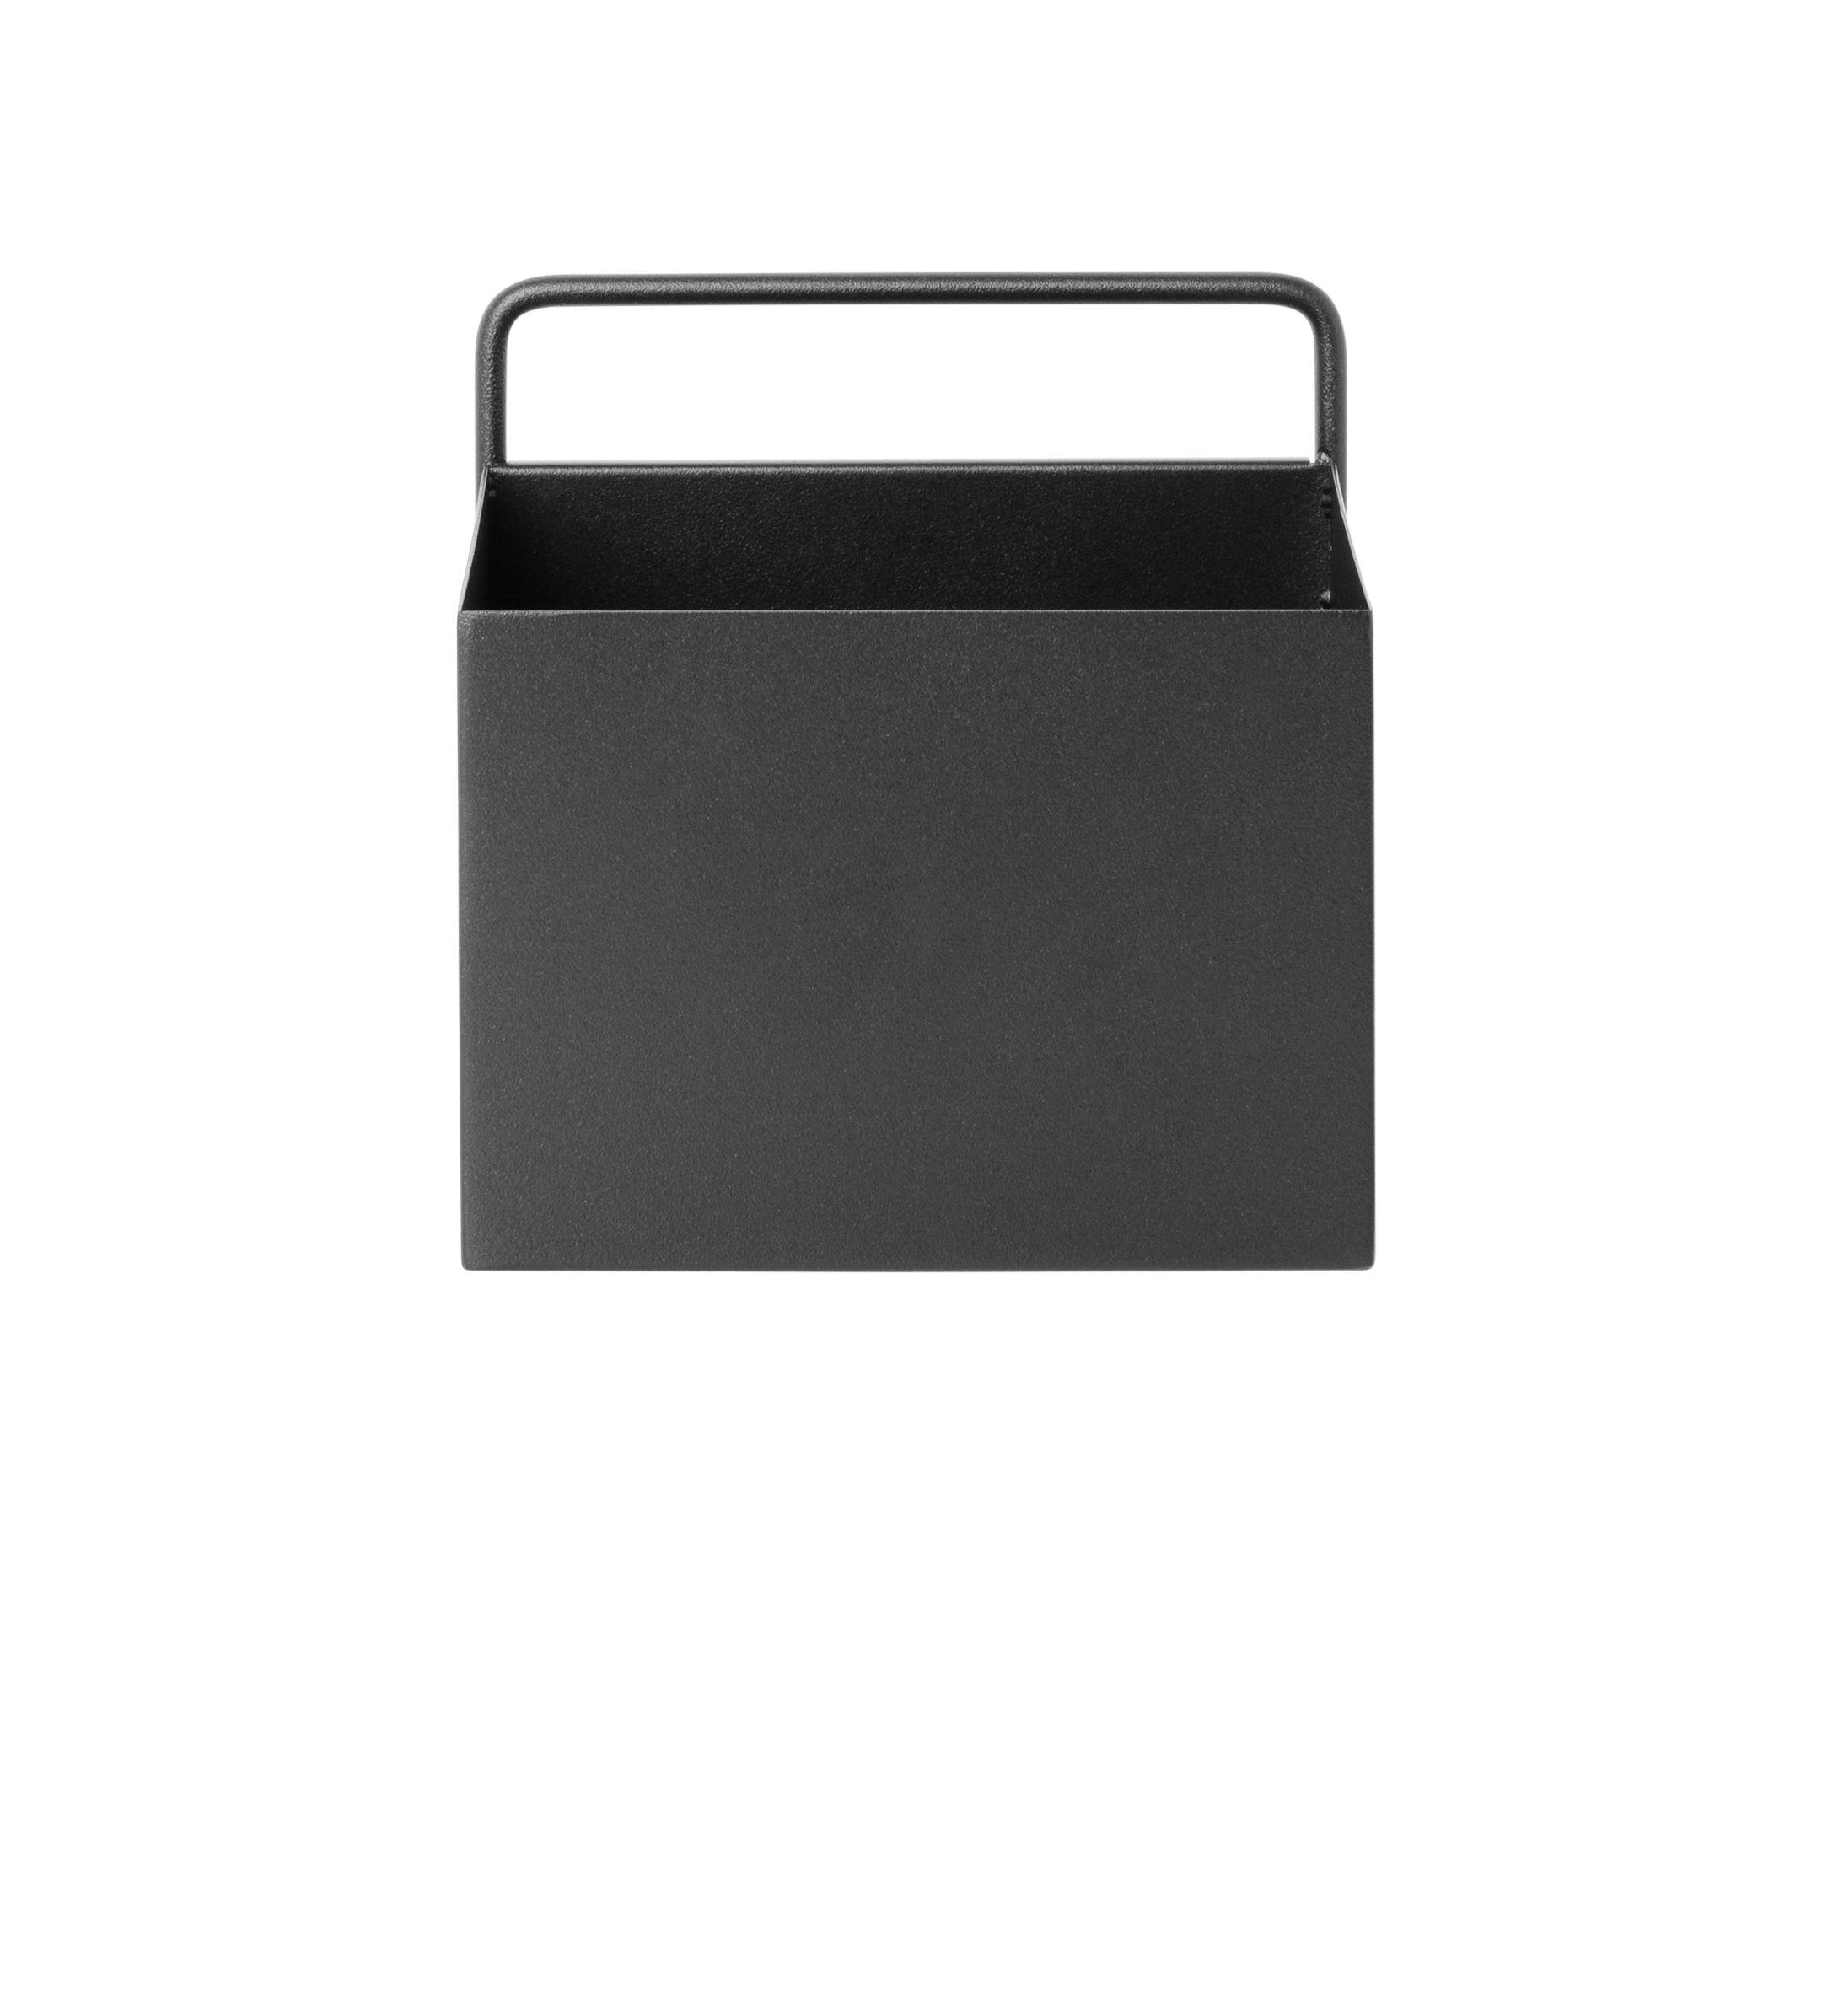 Outdoor - Töpfe und Pflanzen - Carré Blumentopf / L 15,6 cm x H 15,6 cm - Ferm Living - Schwarz - epoxy-beschichtetes Metall